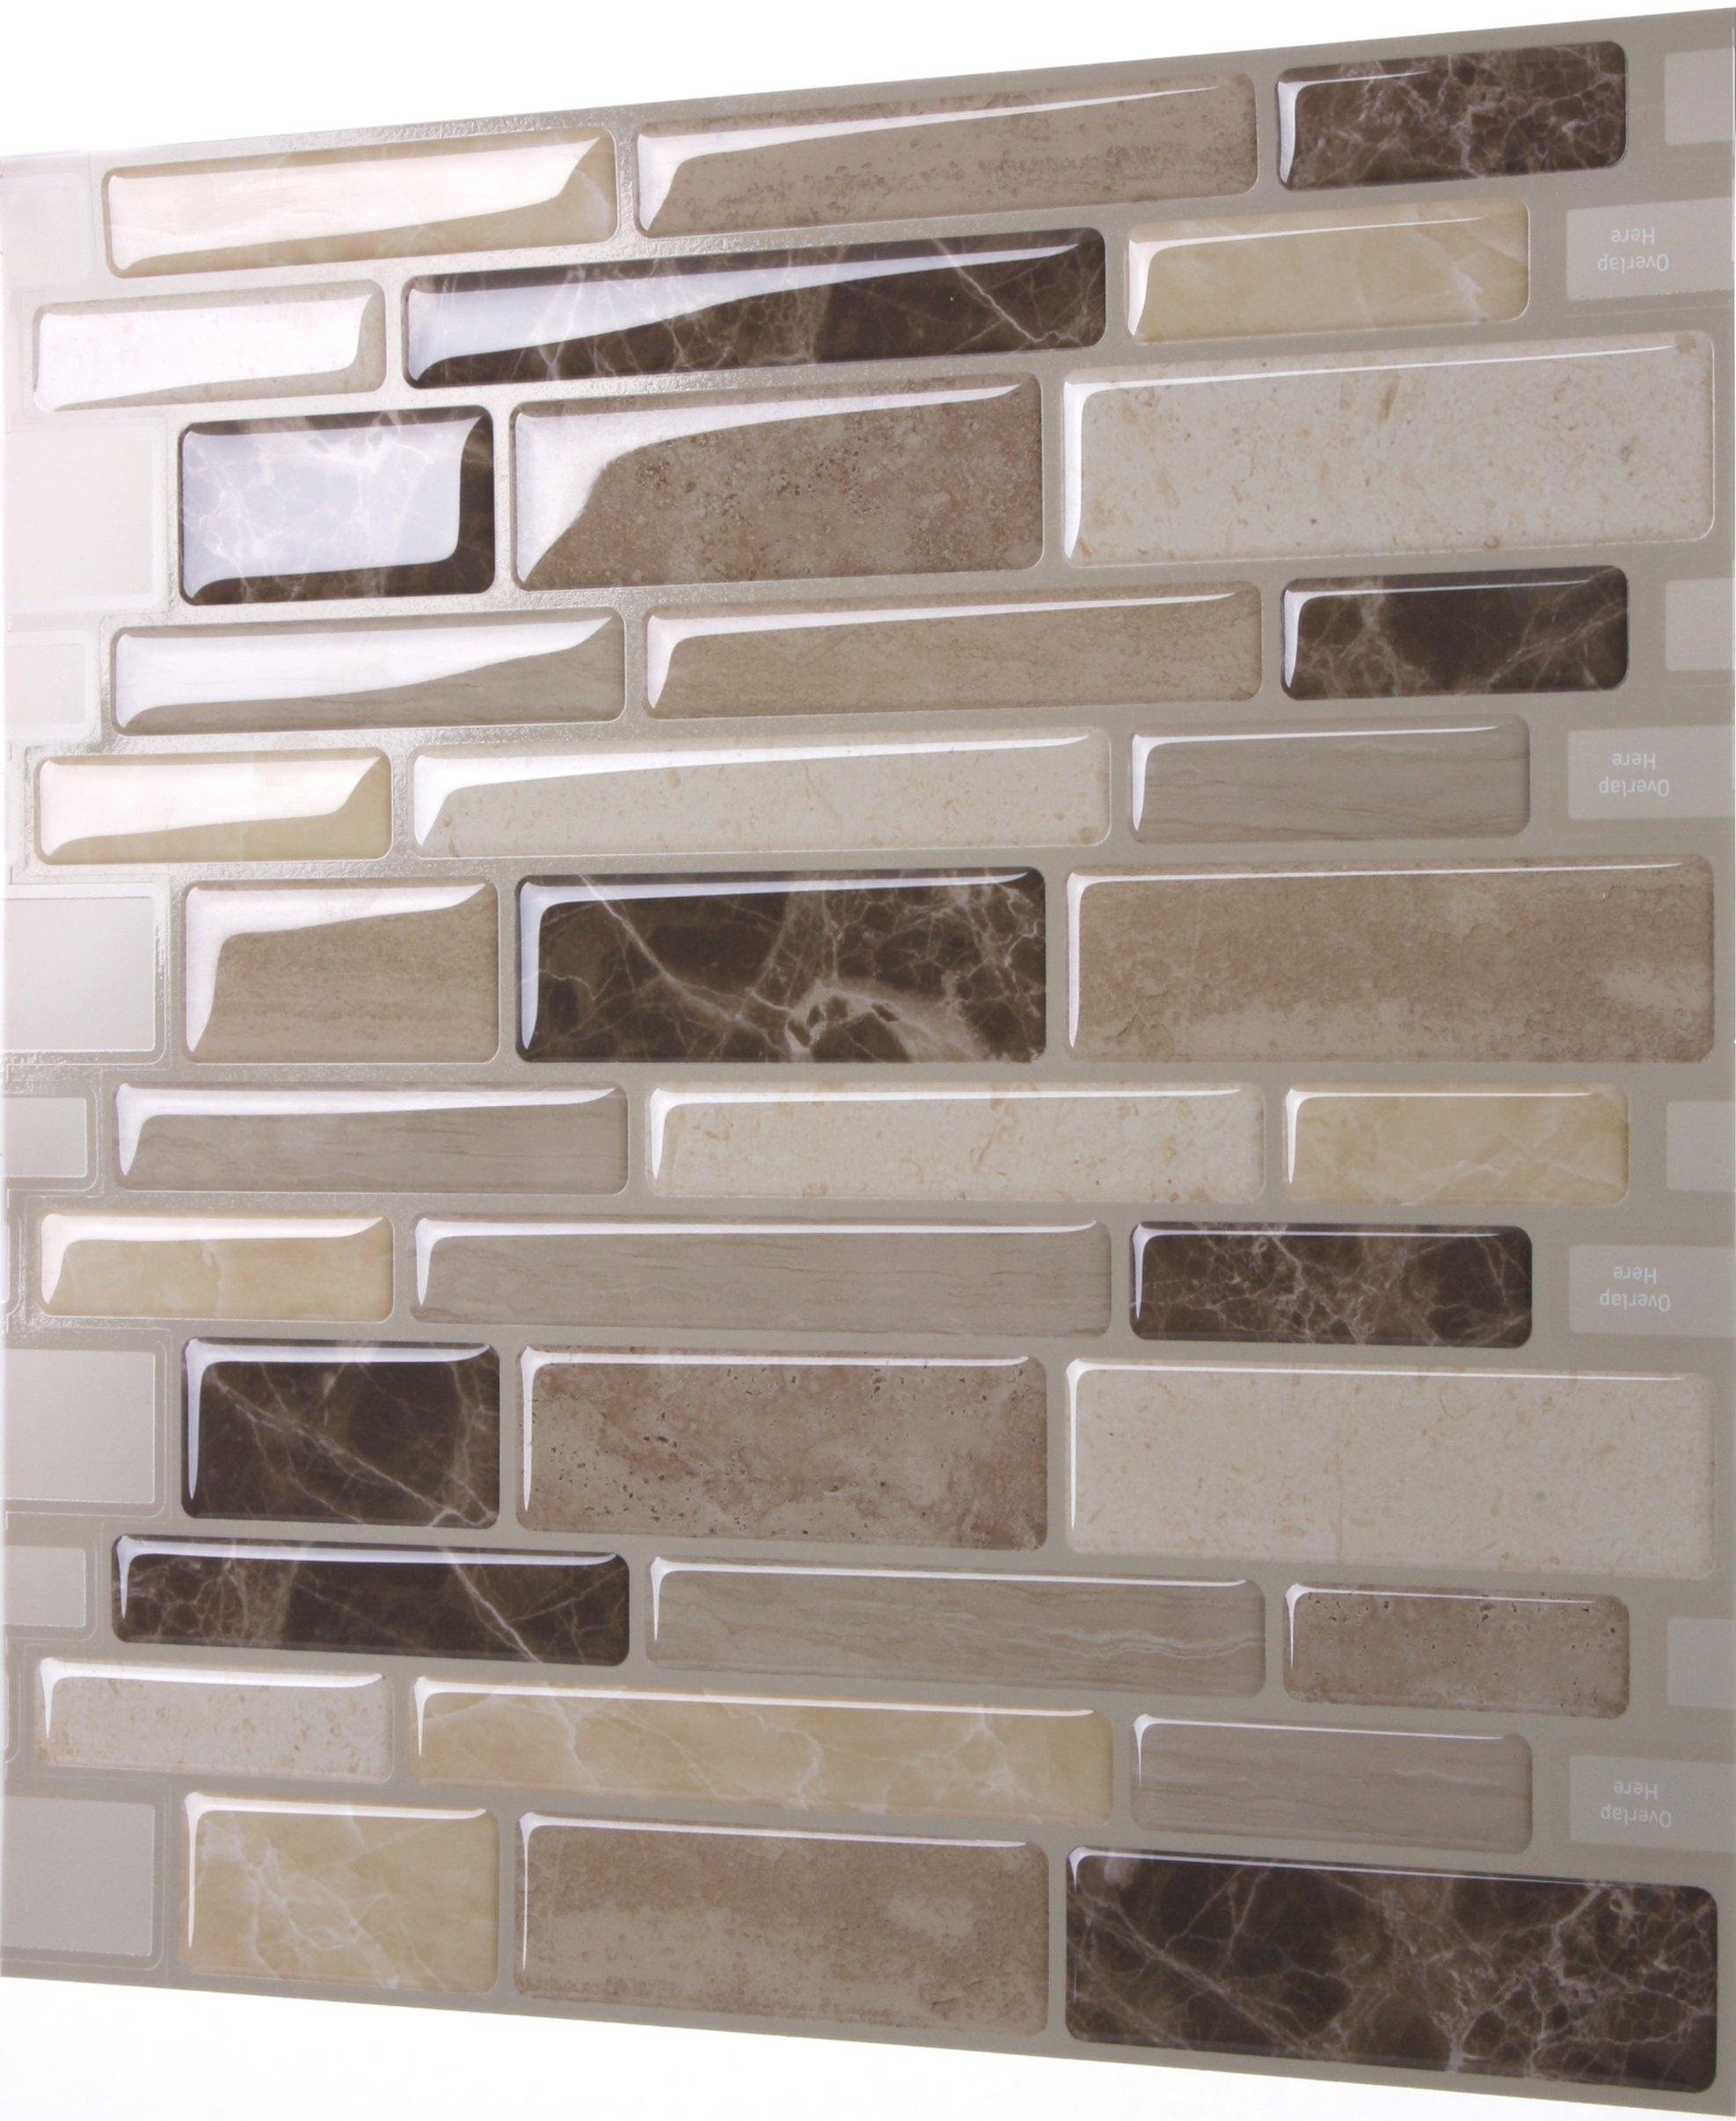 tic tac tiles anti mold peel and stick wall tile in polito bella 10 ebay. Black Bedroom Furniture Sets. Home Design Ideas